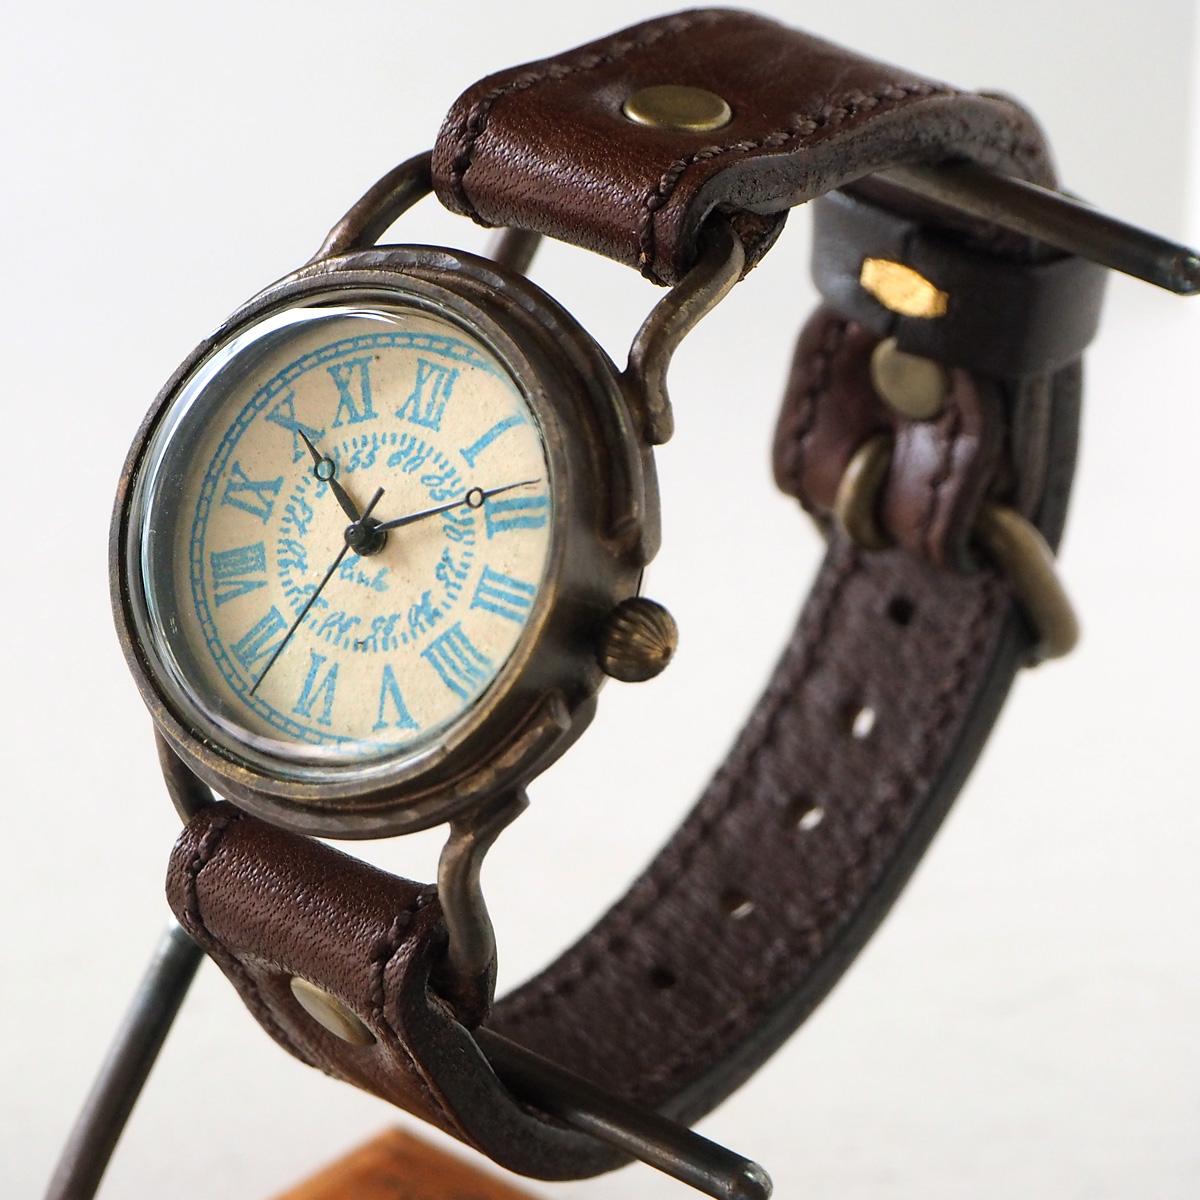 "ARKRAFT(アークラフト) 時計作家・新木秀和 手作り腕時計 ""Marvin Medium"" ローマ数字 プレミアムストラップ [AR-C-012-RO]"